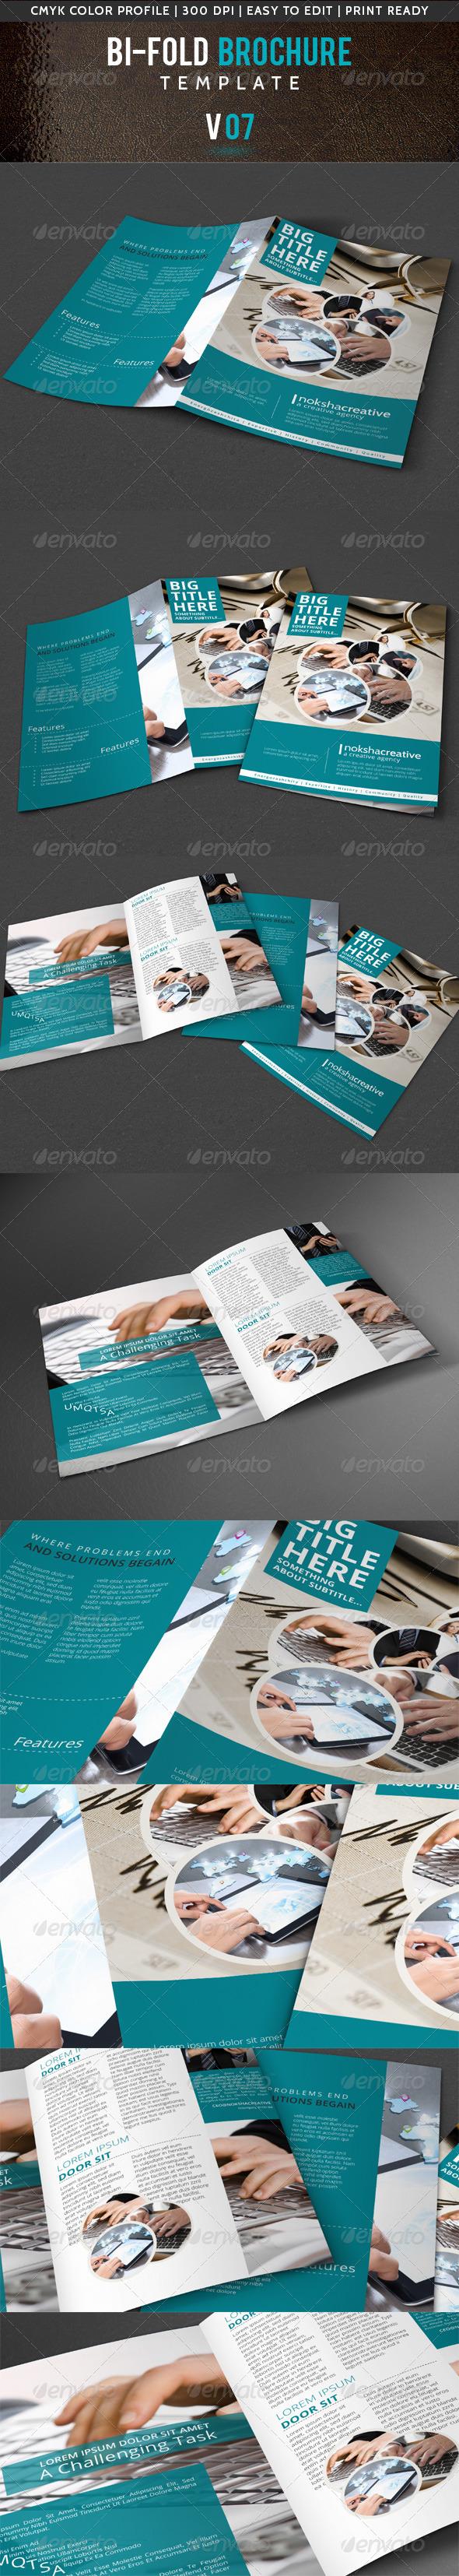 Corporate Bi-Fold Brochure V-07 - Corporate Brochures